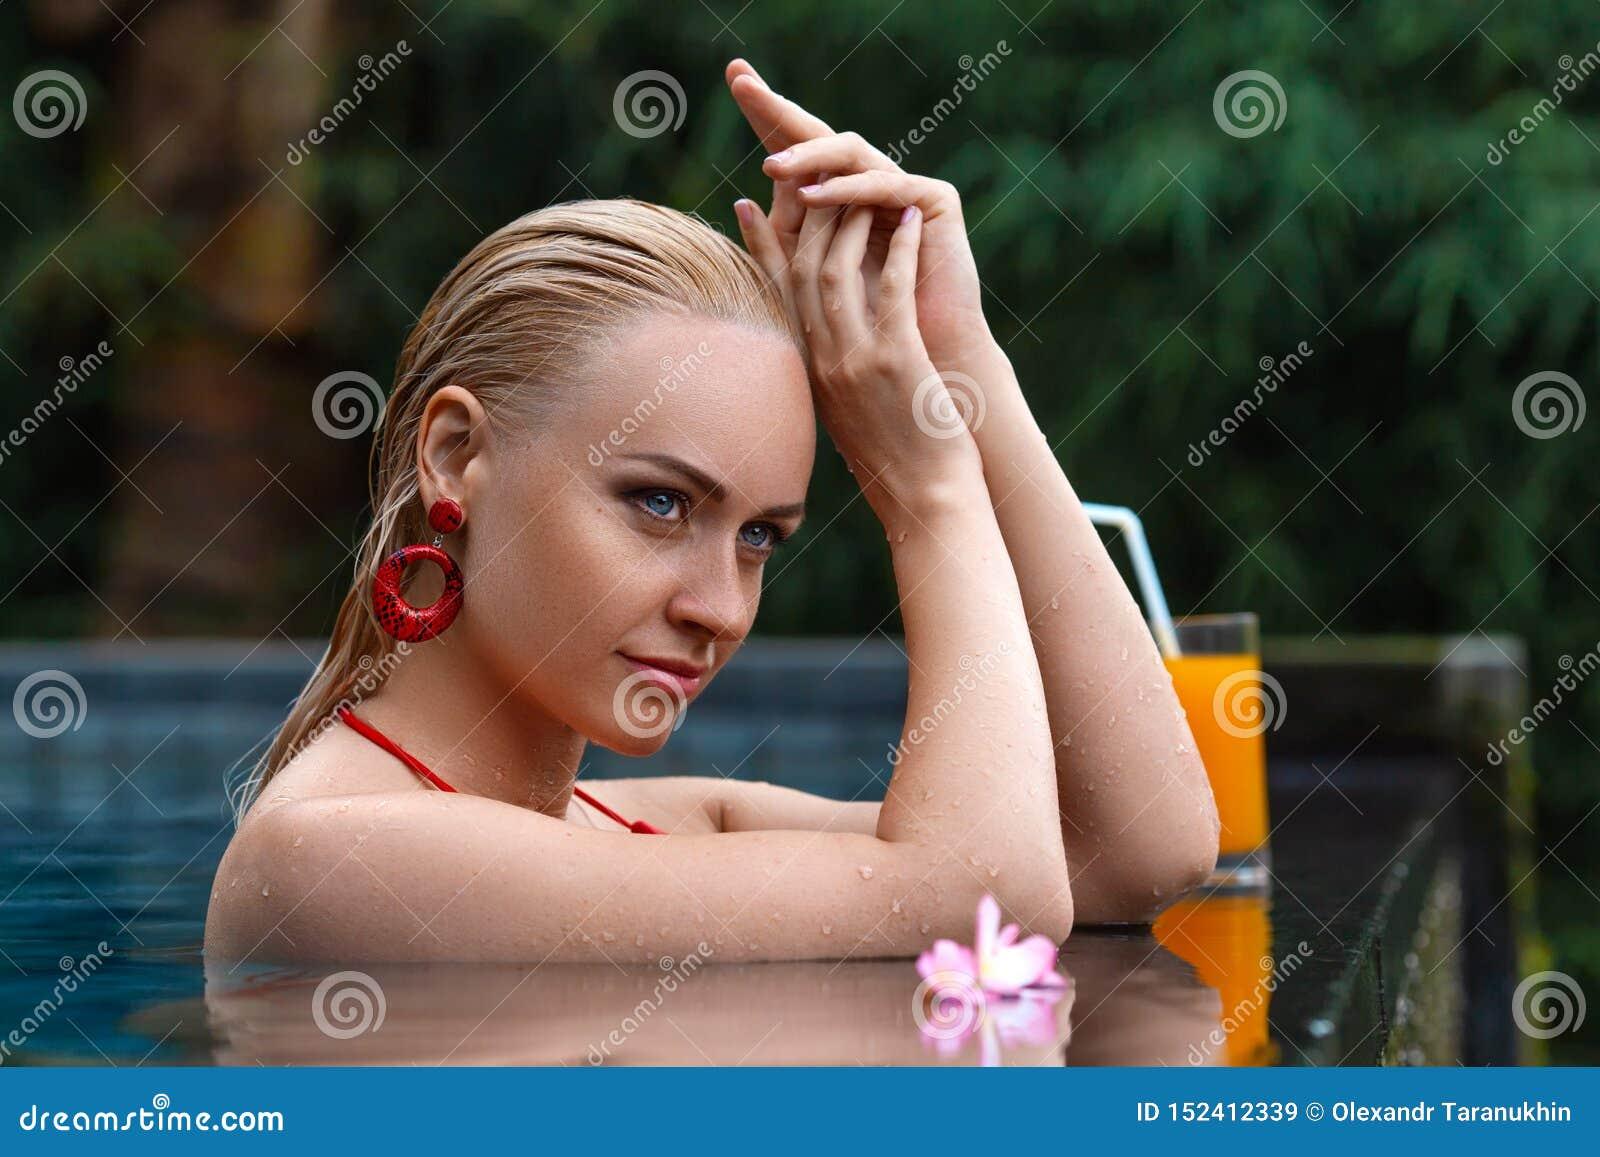 Woman posing in the tropical swimming pool